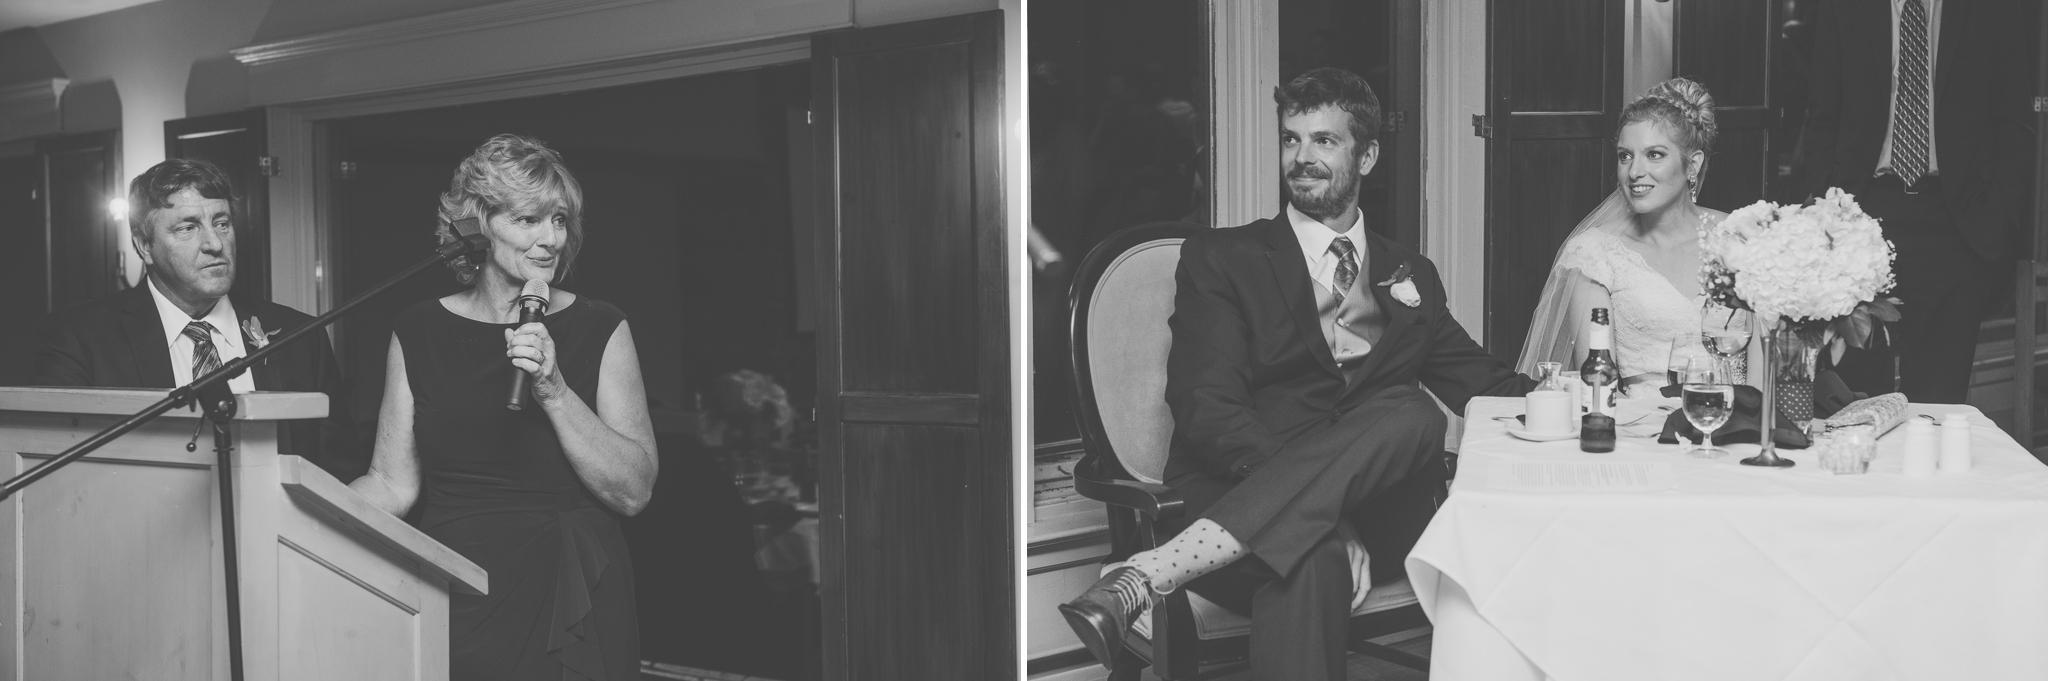 cottage wedding, keene, ontario, cottage, quiet wedding, wedding on the lake, toronto photographer, toronto photography, northumberland county, port hope photographer, port hope wedding photographer, toronto wedding photographer, bride, groom, summer wedding, peterborough wedding, peterborough wedding photography, peterborough wedding photographer, keene wedding, keene wedding photographer, documentary wedding photography, documentary wedding photographer, candid wedding photography, cottage, trees, nature, veil, intimate wedding, black and white, bride and groom, love, nature, waterfront, summer, reception, emotional, laughters, tears